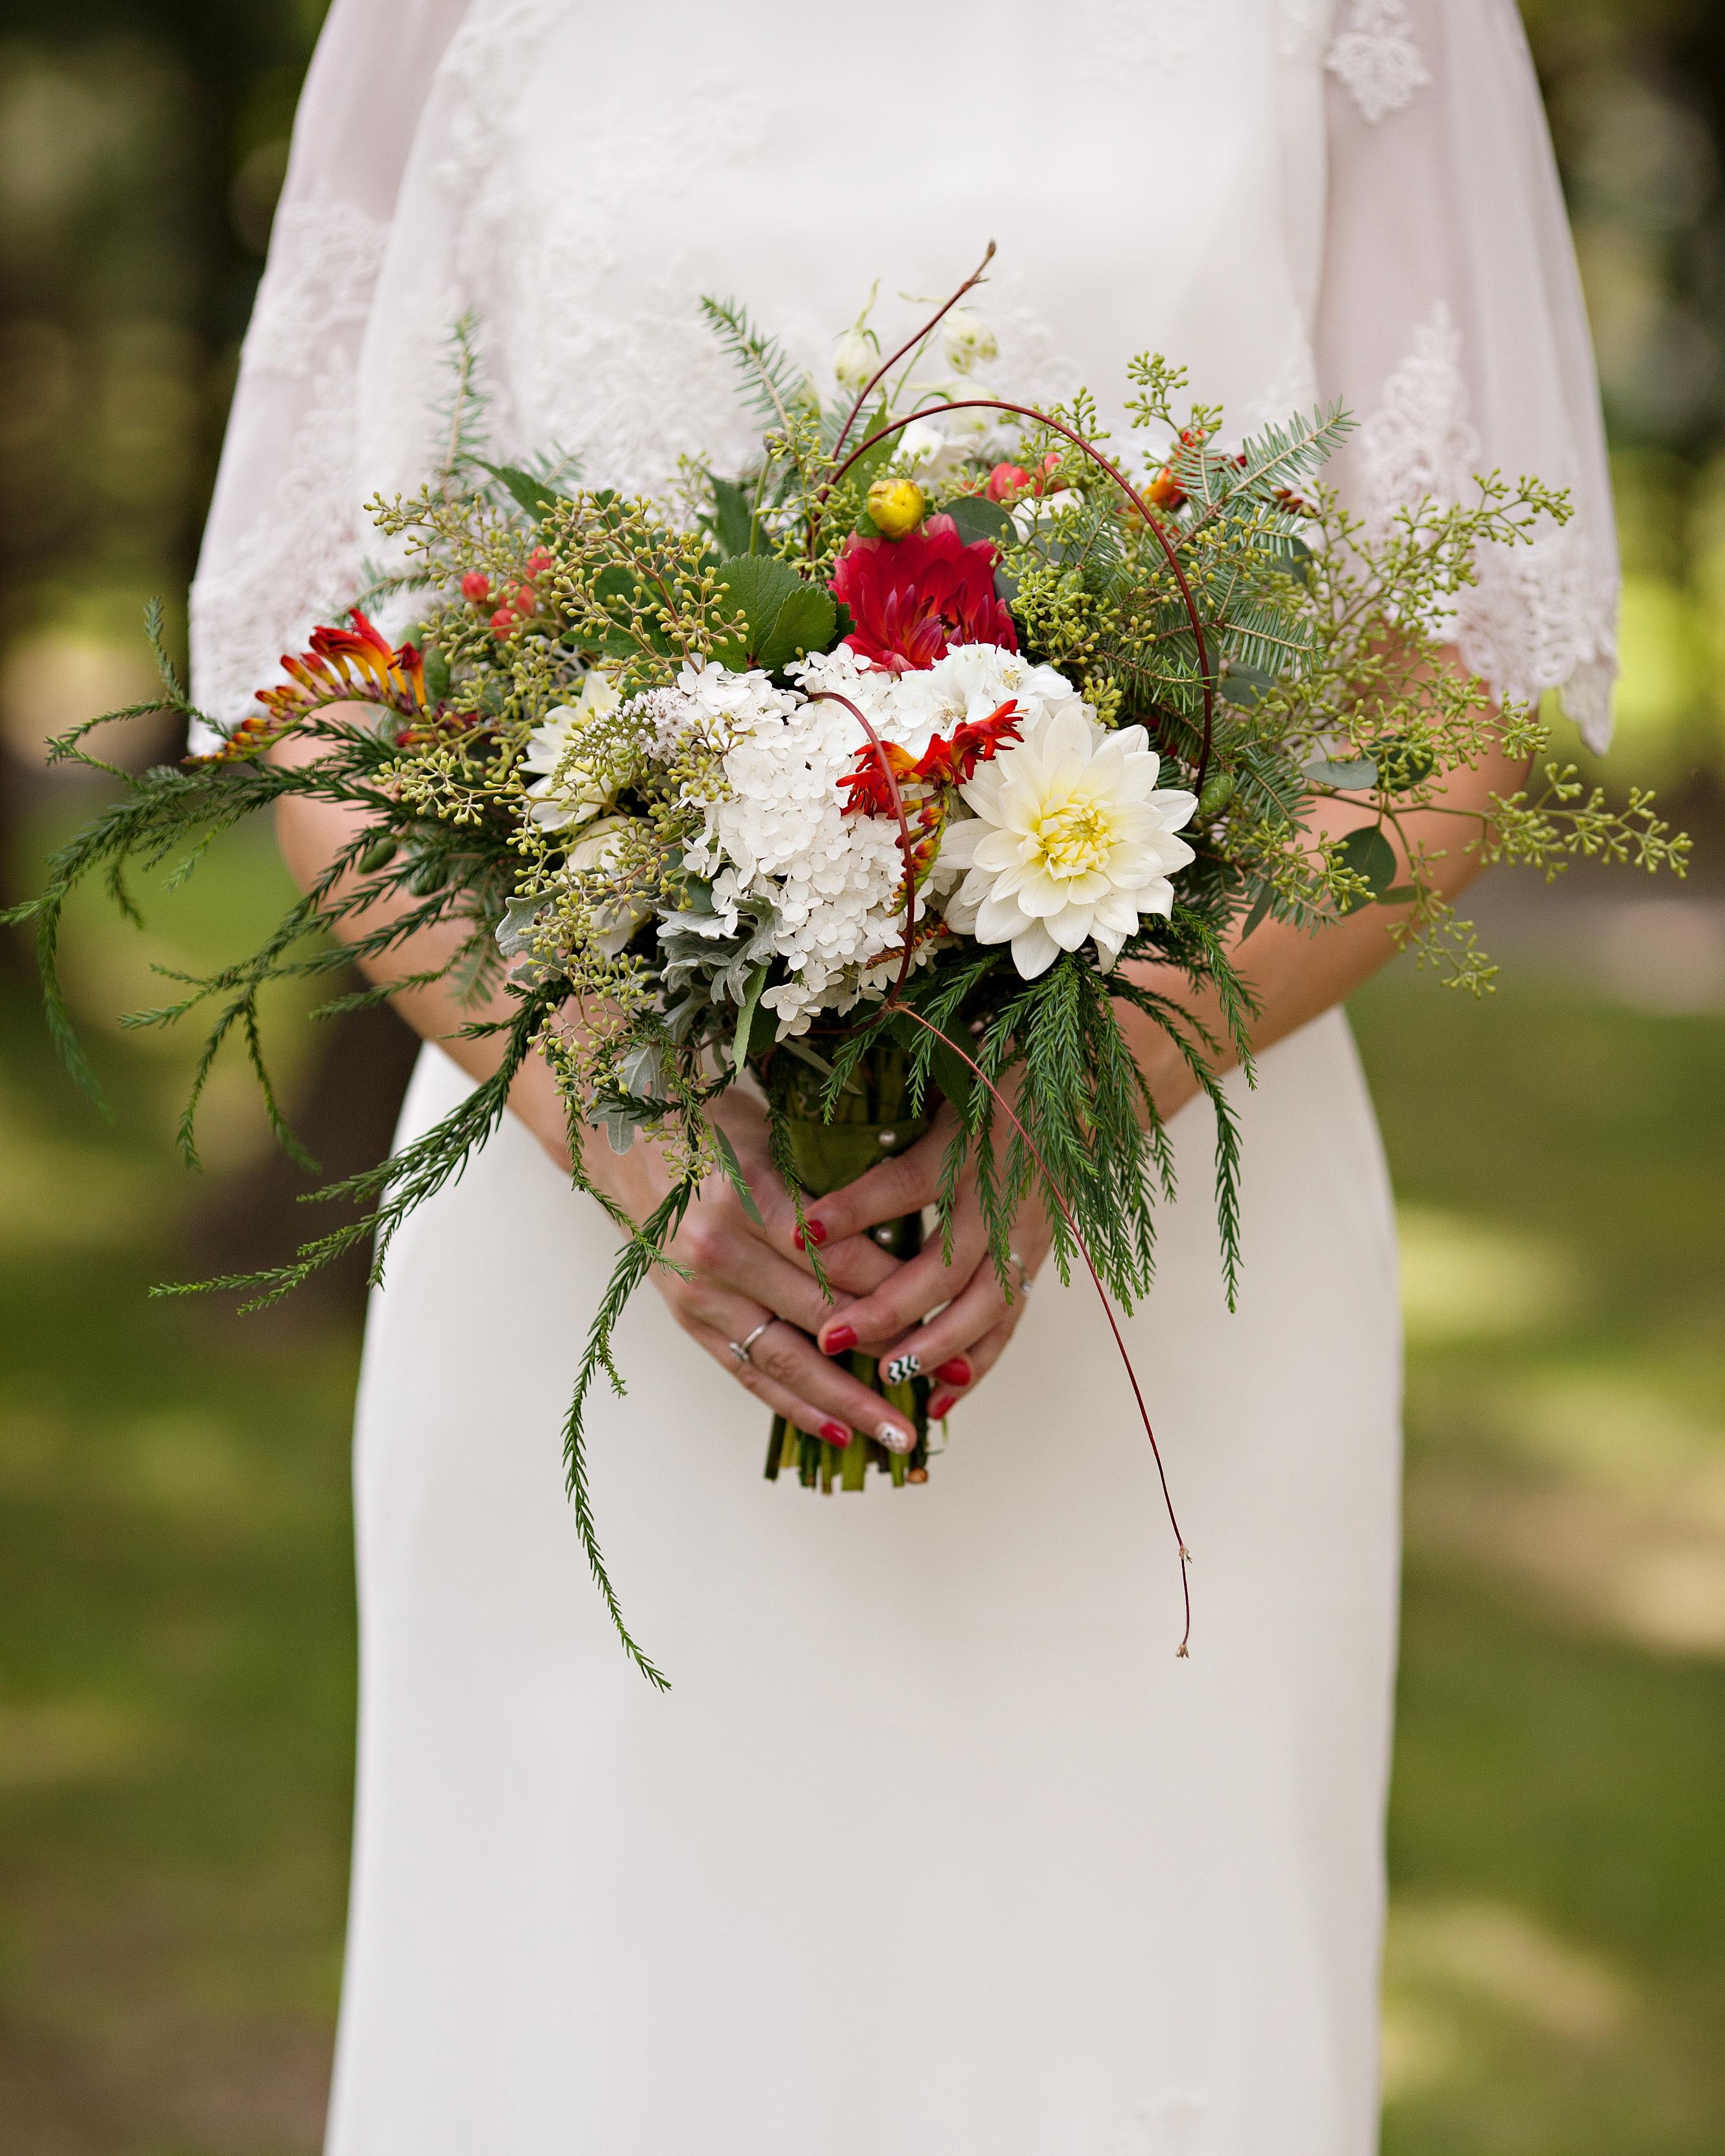 kristy-marc-wedding-bouquet-0414.jpg